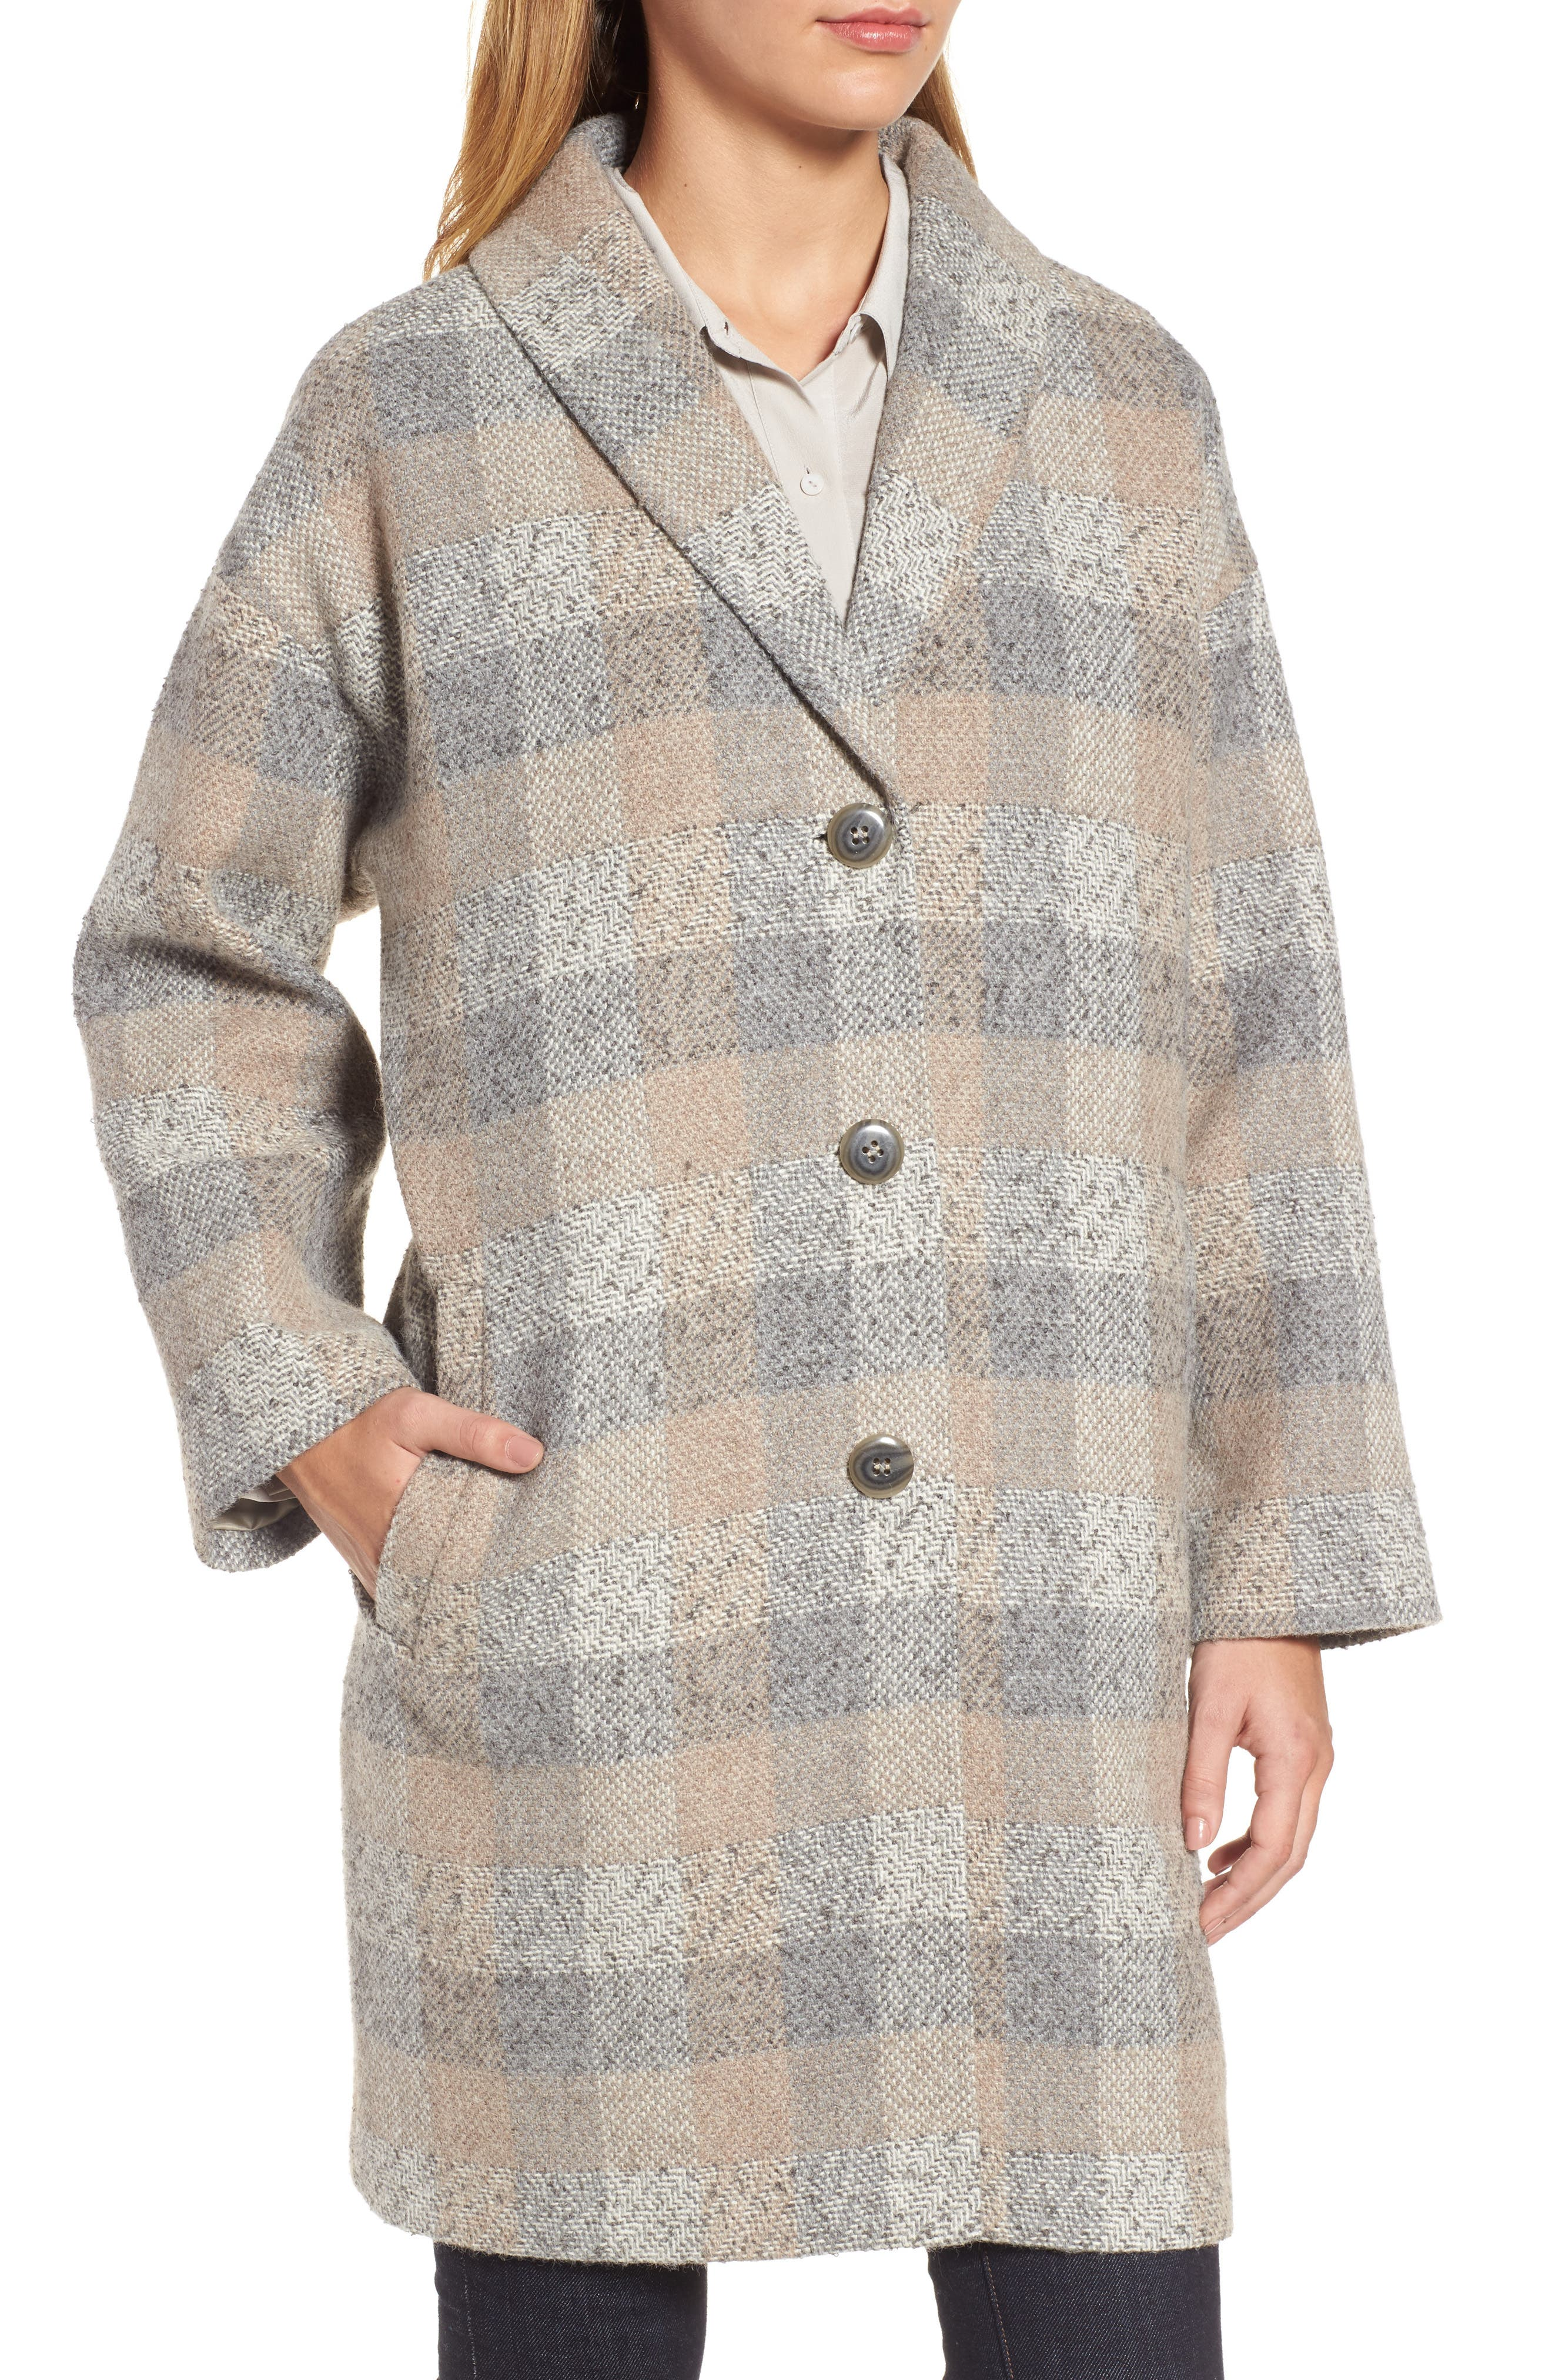 Plaid Alpaca Blend Coat,                             Alternate thumbnail 4, color,